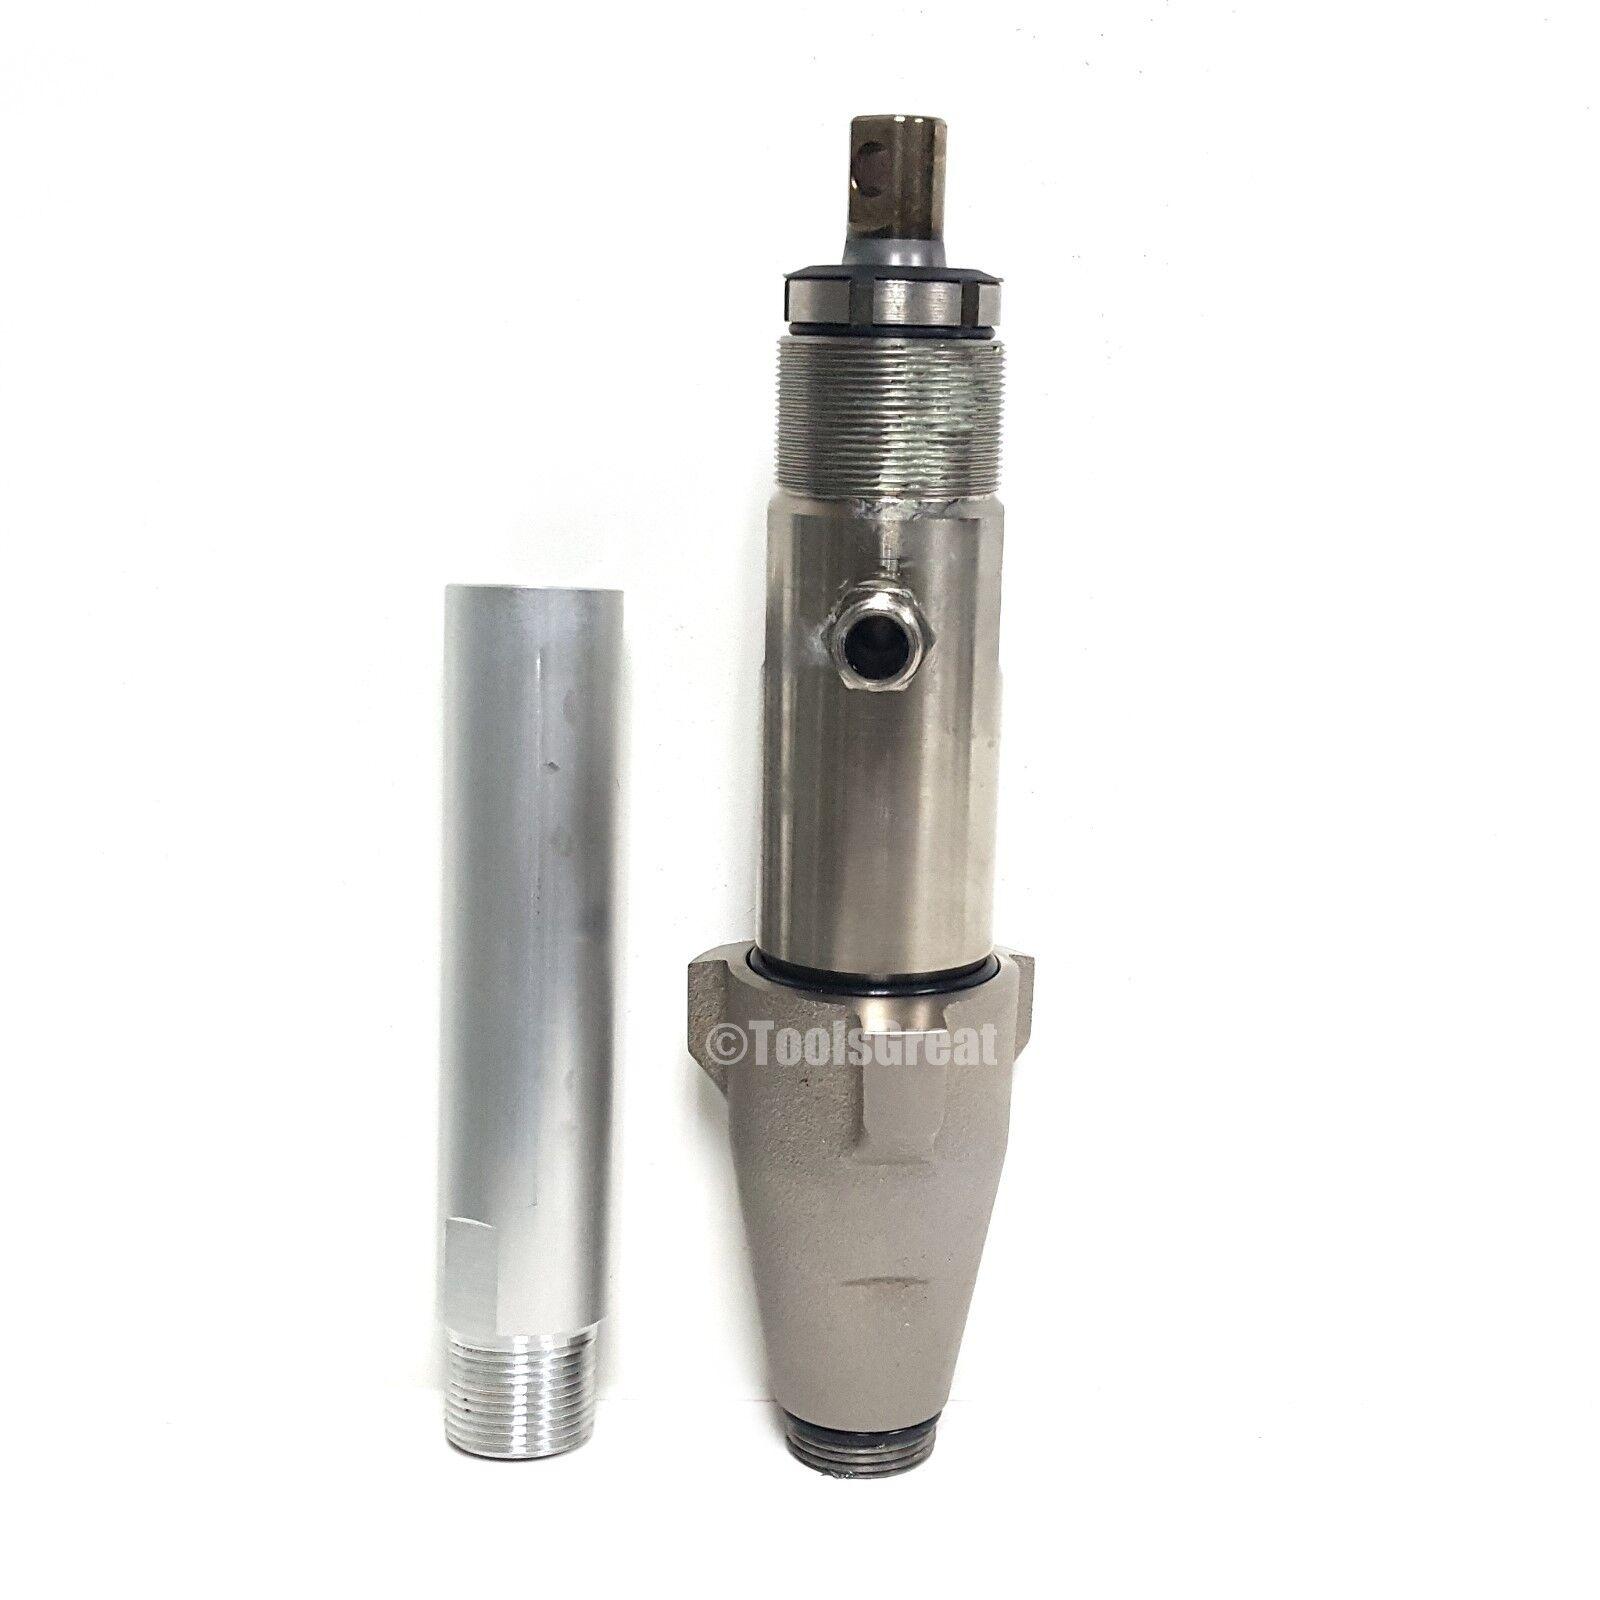 Graco 16Y706 Fluid Displacement Pump for Ultra Max II 1095 & 1595 & GMAX II 5900